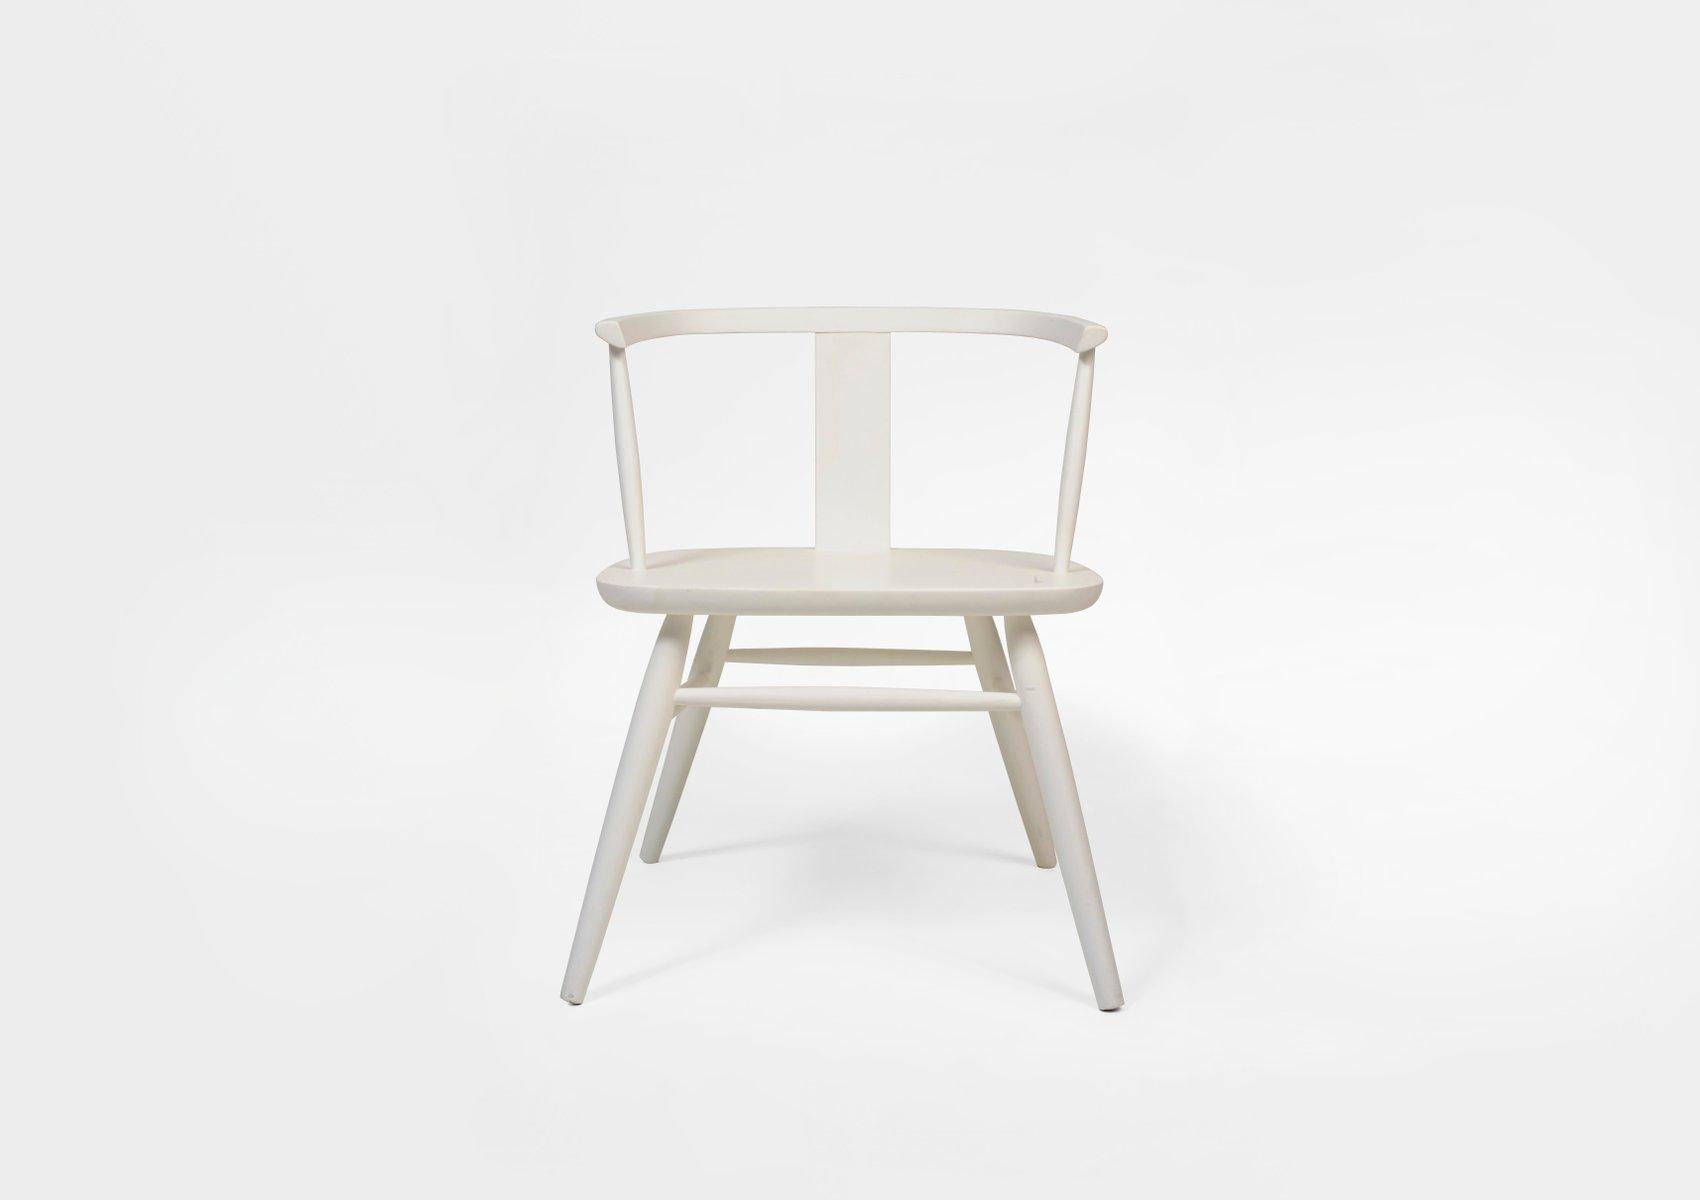 Maun windsor stuhl in farbe von patty johnson bei pamono kaufen - Windsor stuhl ...